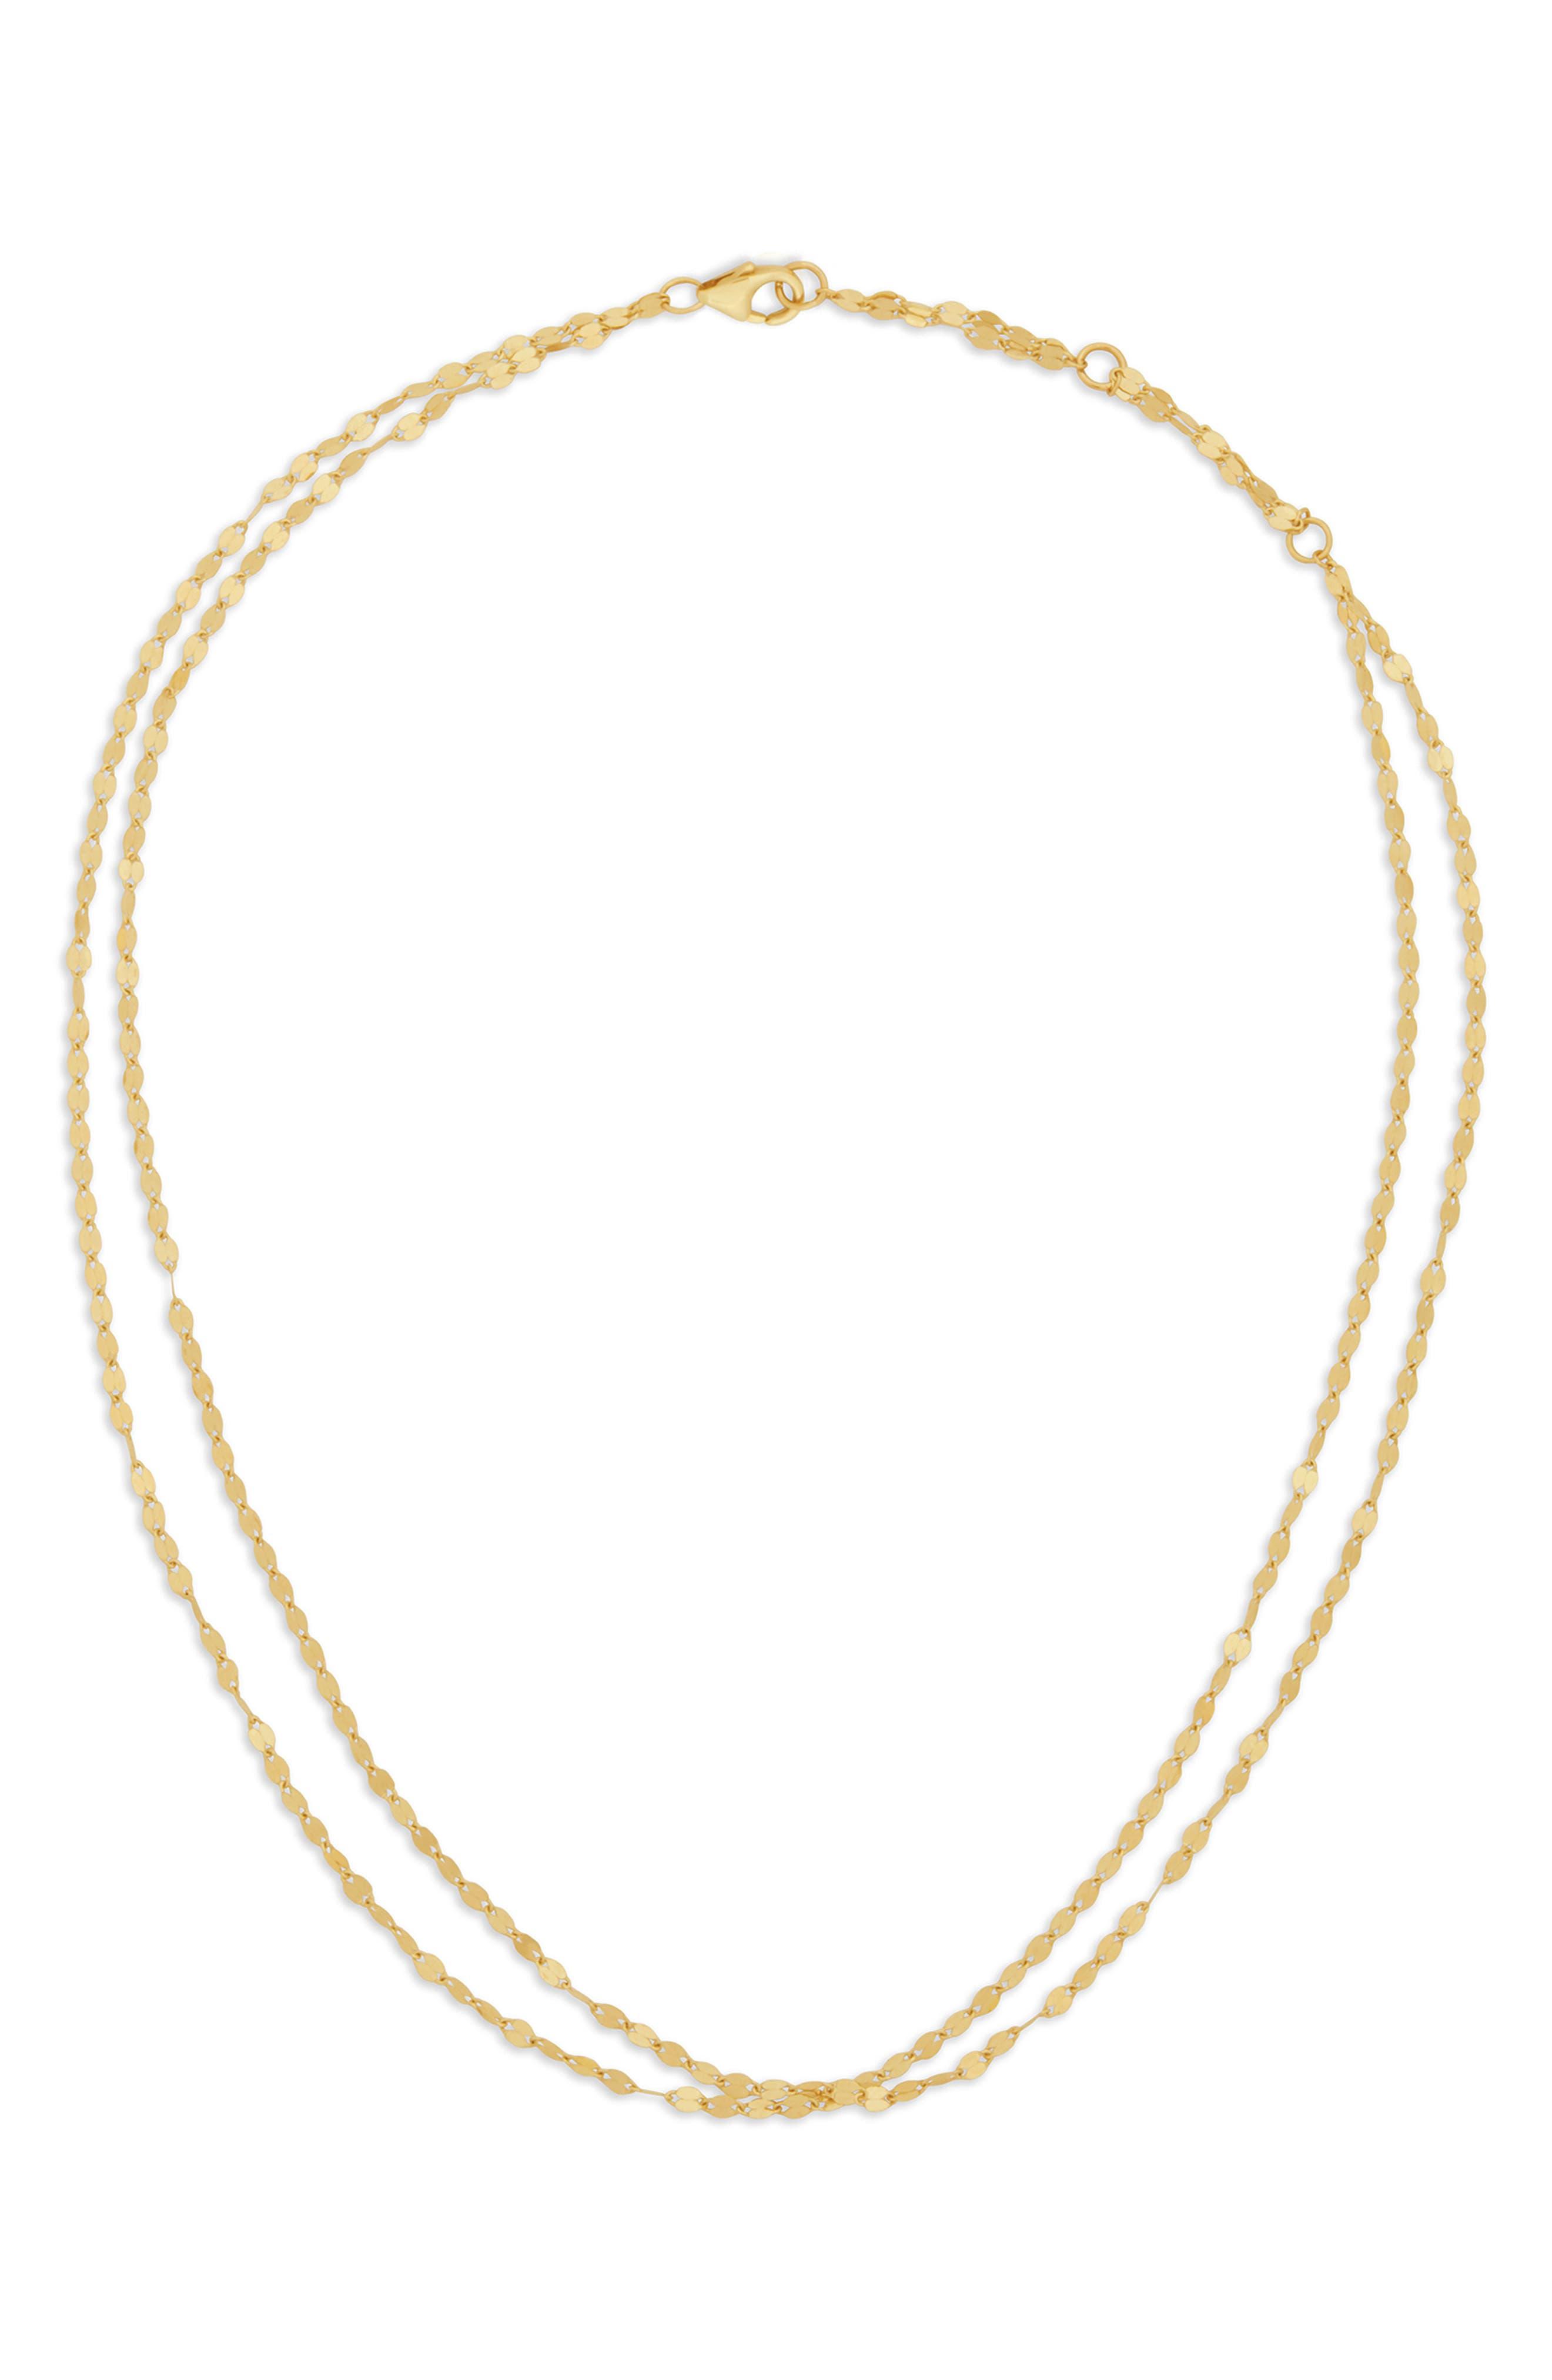 Alias Double Blake Short Necklace,                         Main,                         color, Yellow Gold